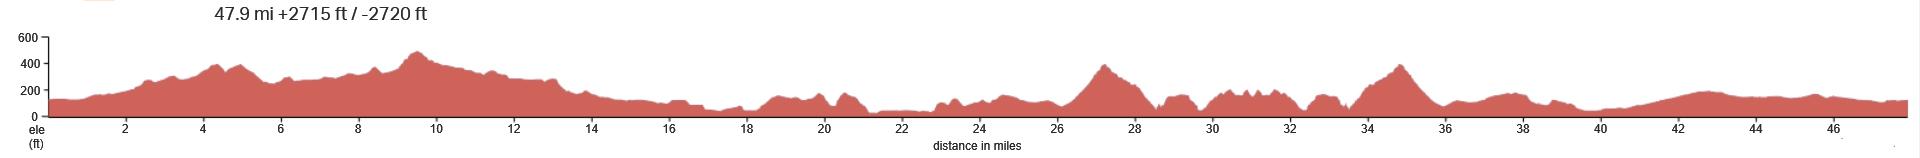 SLO-Morro-Montana de Oro Elevation-Profile